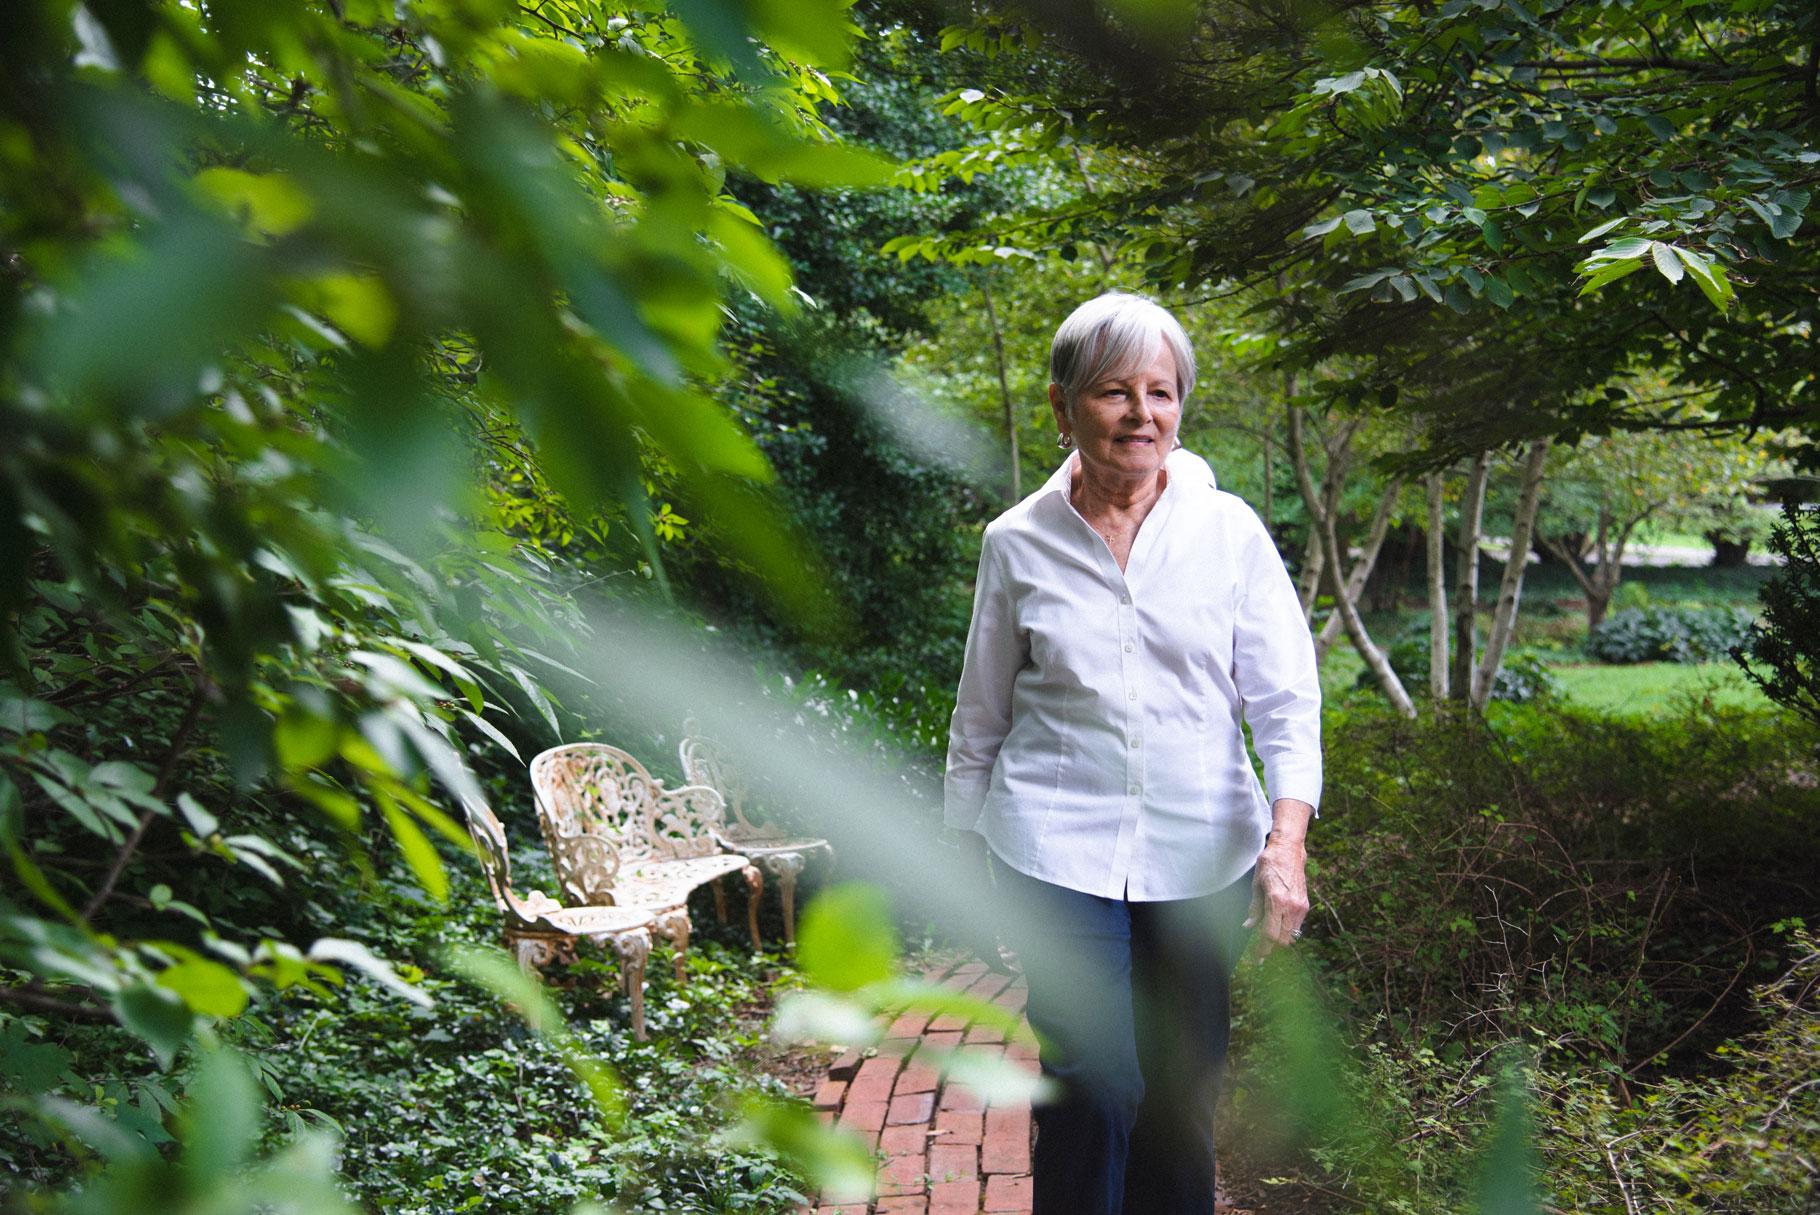 Gayle walks along a red brick path in her garden.